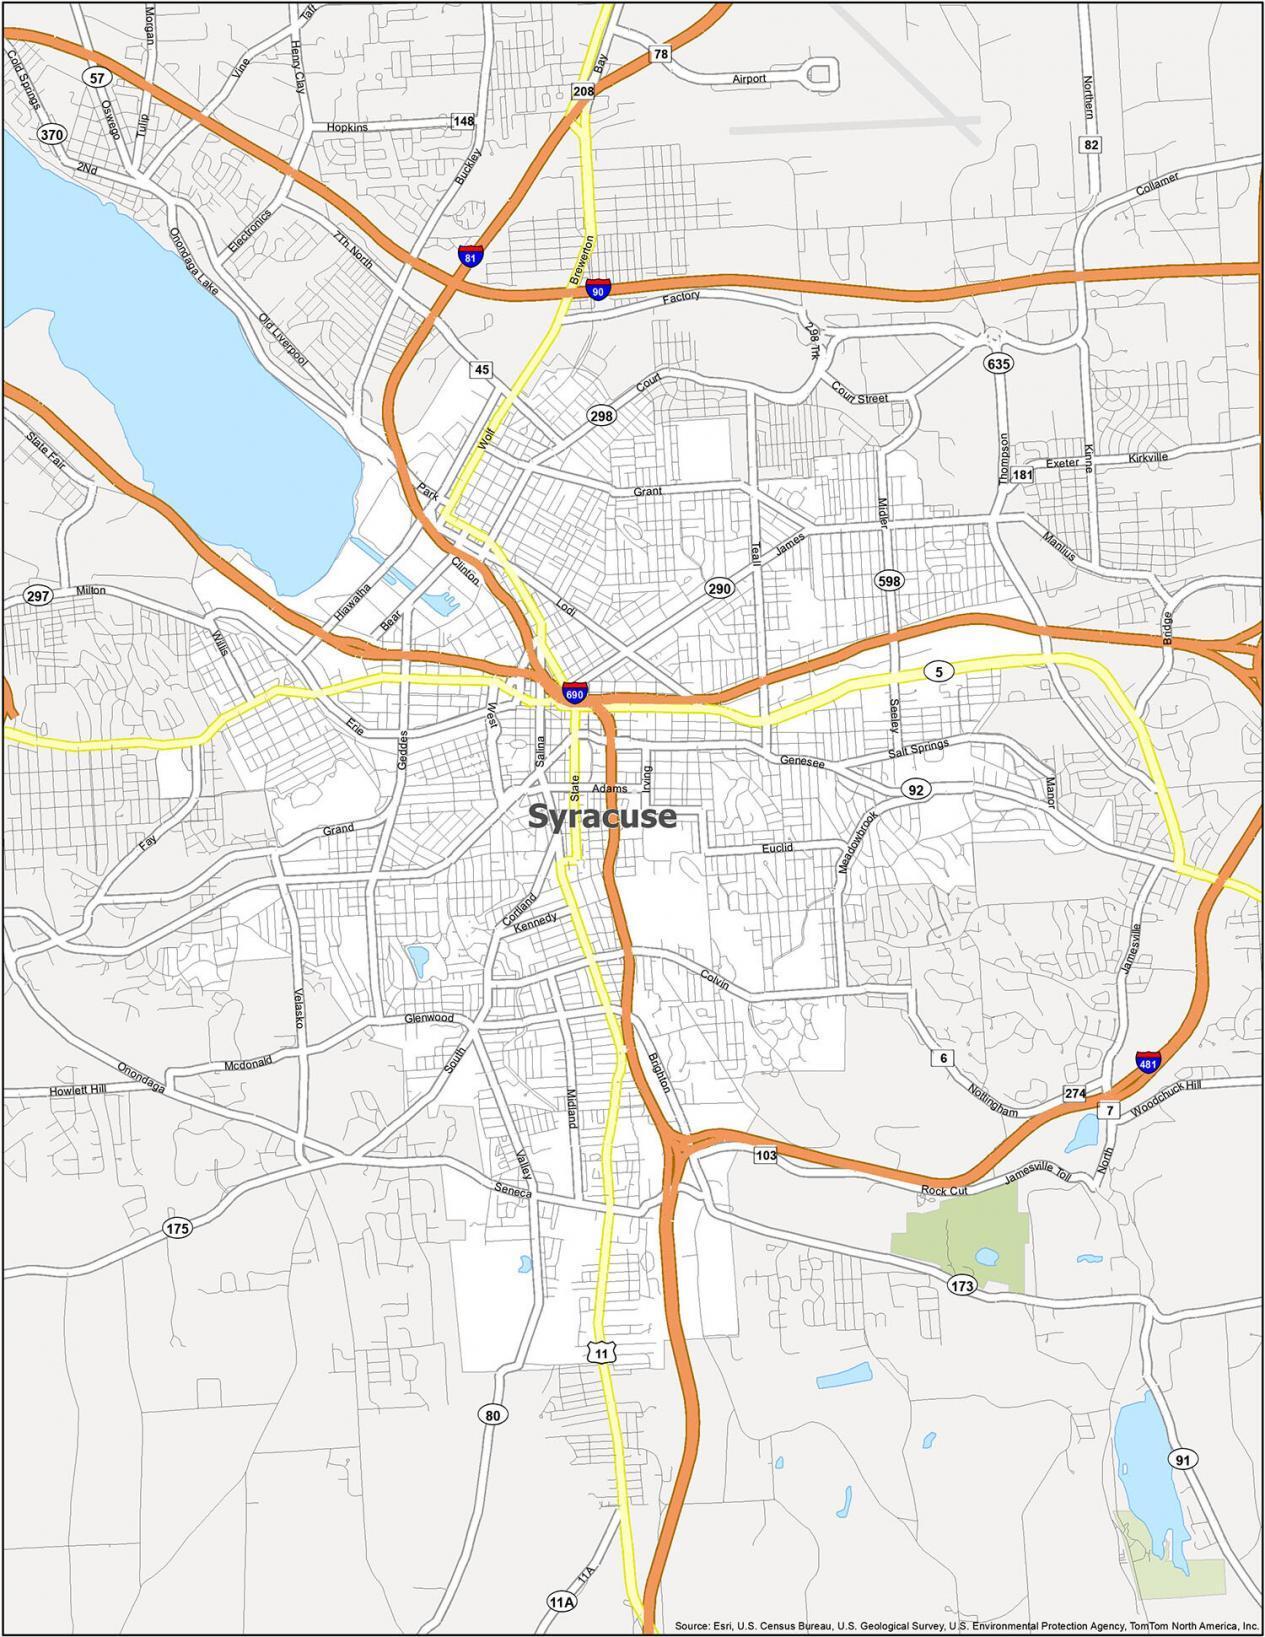 Syracuse Road Map